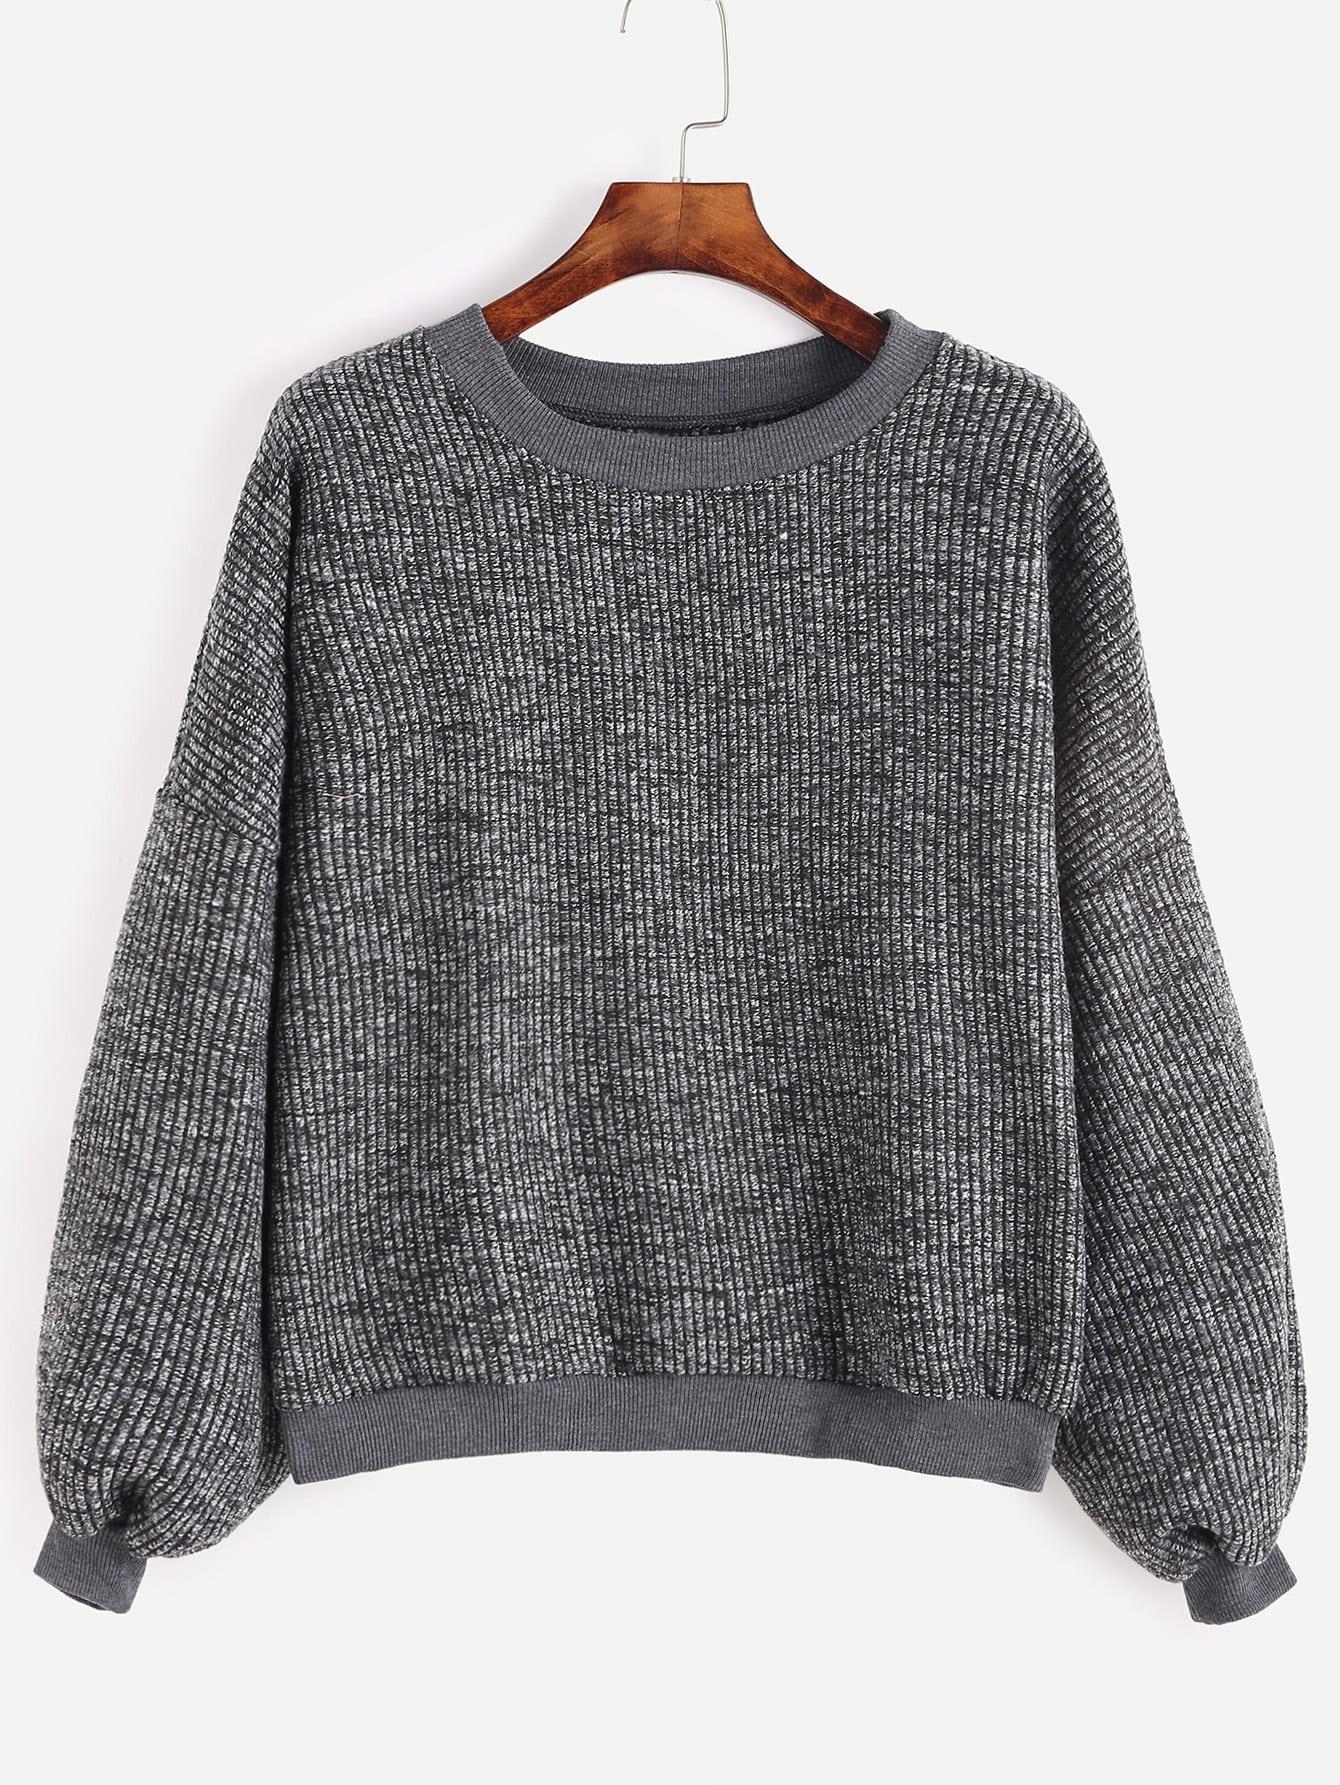 Dark Grey Drop Shoulder Ribbed Sweater sweater160929107